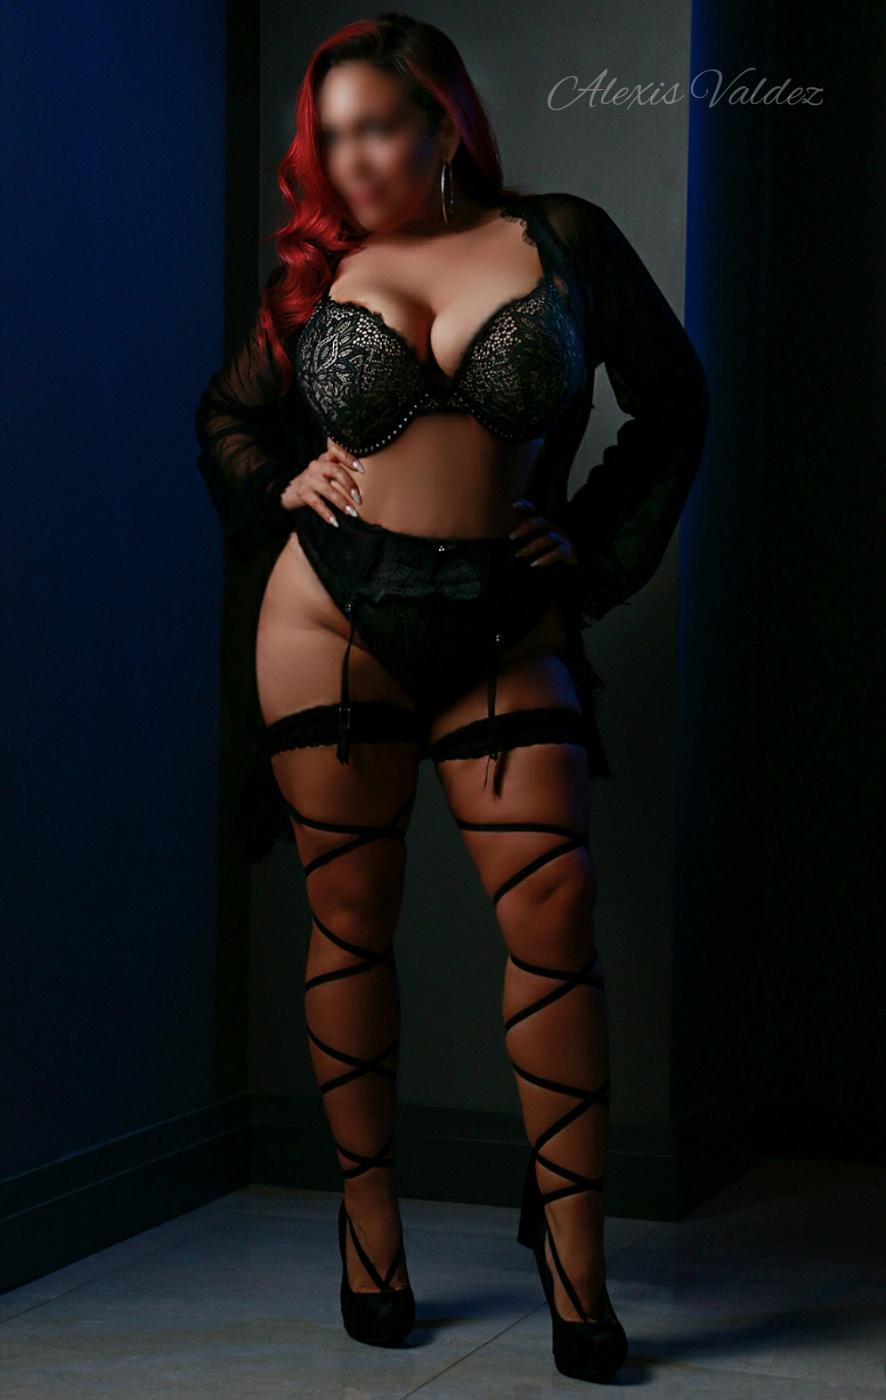 Alexis Valdez